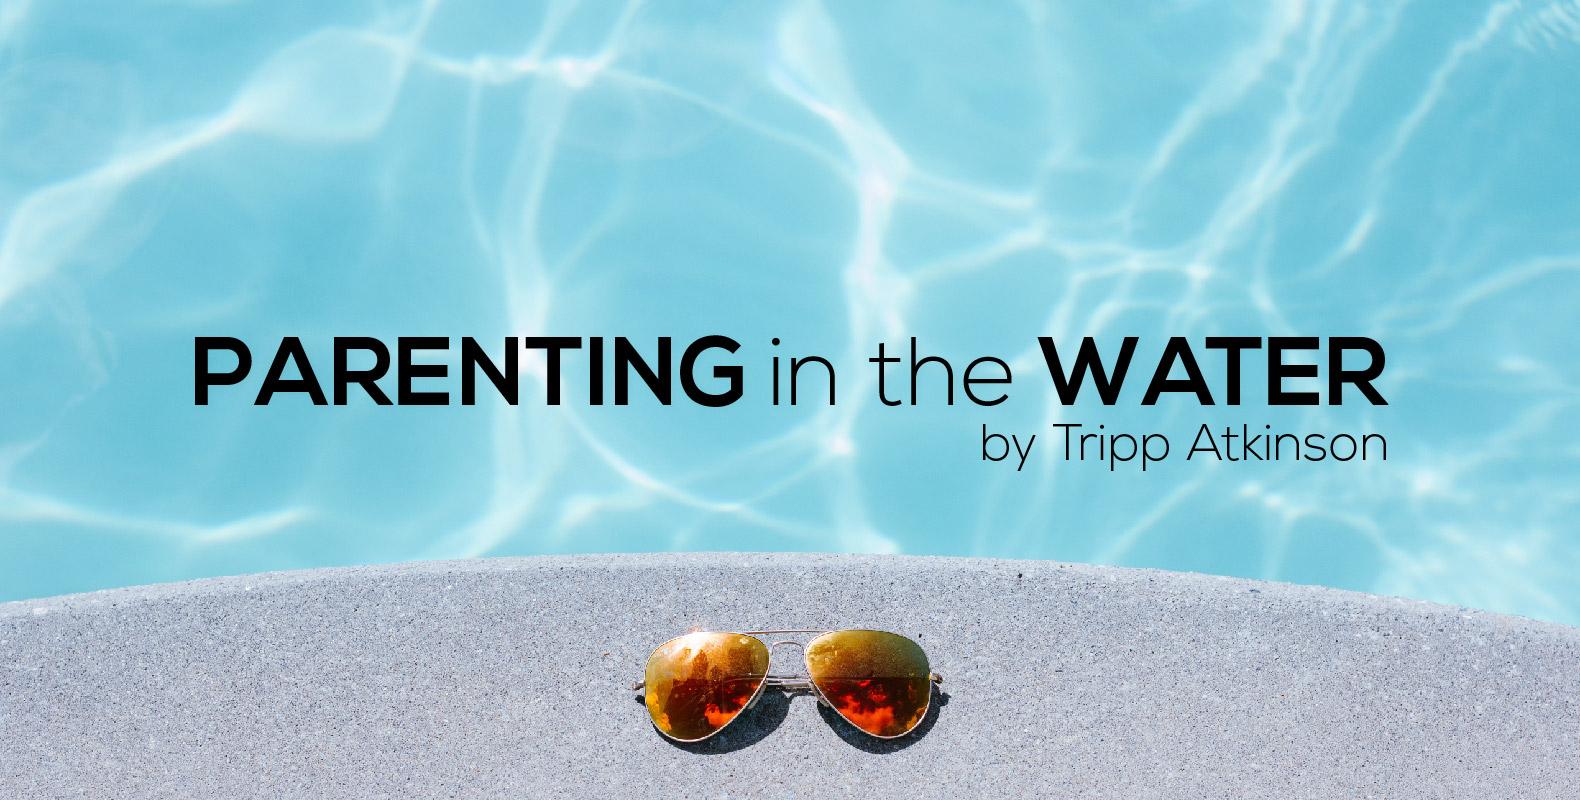 Parenting blog by Tripp Atkinson